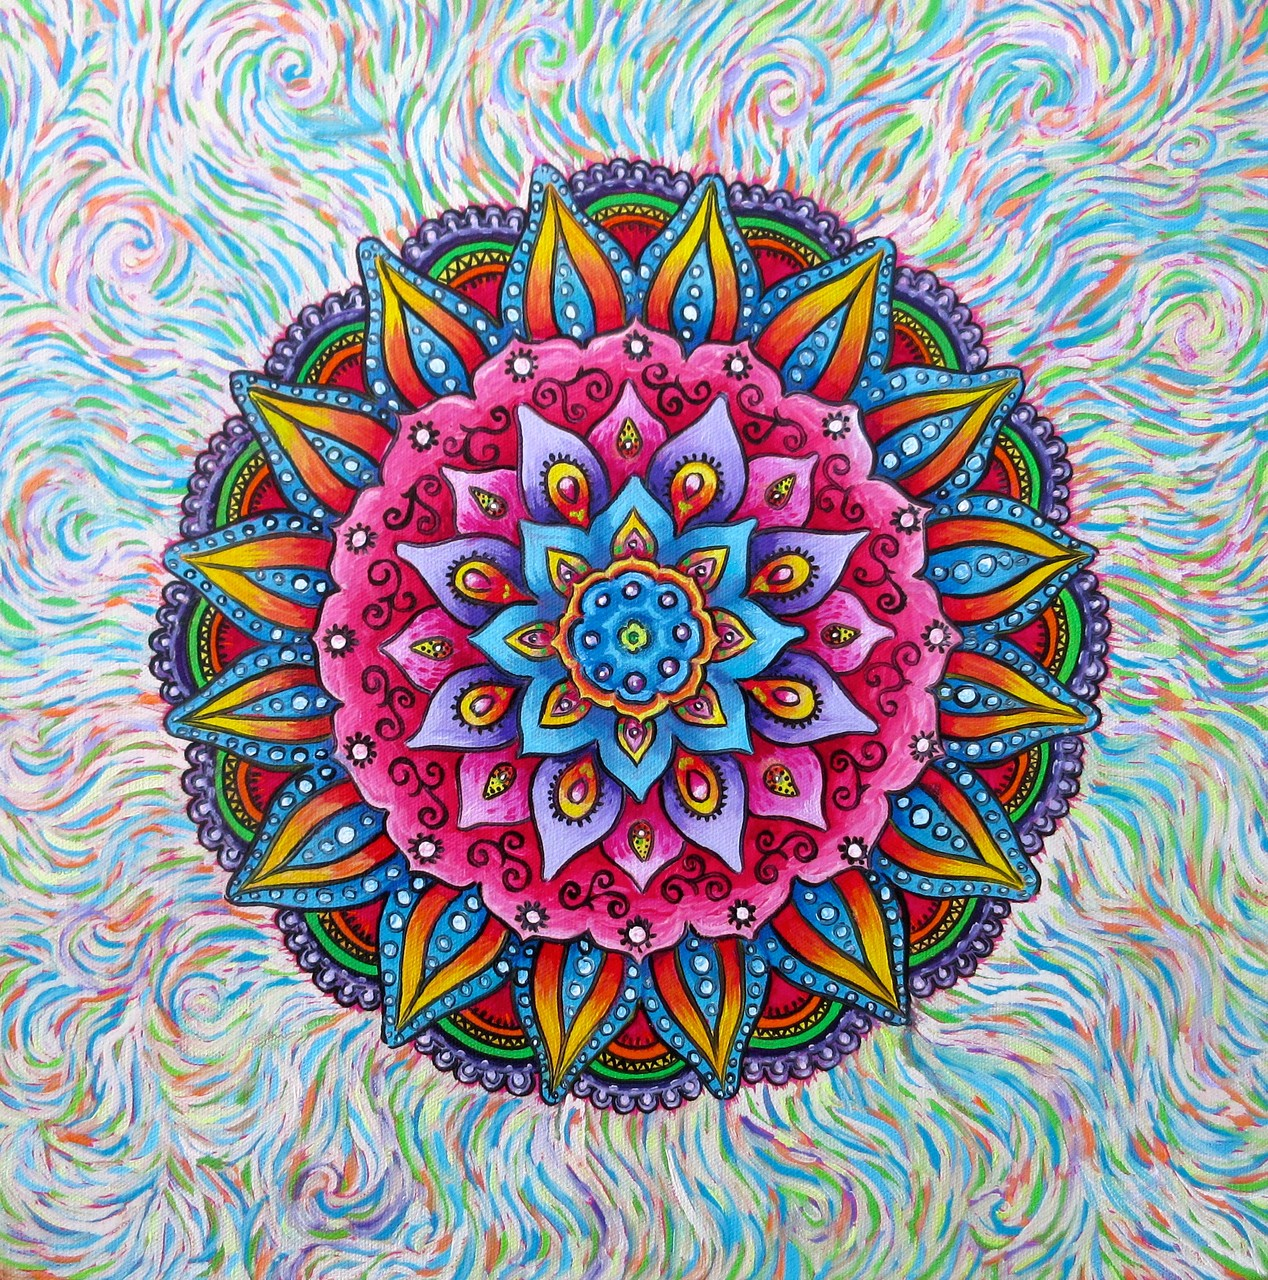 ... in progress, copied the mandala in oils...